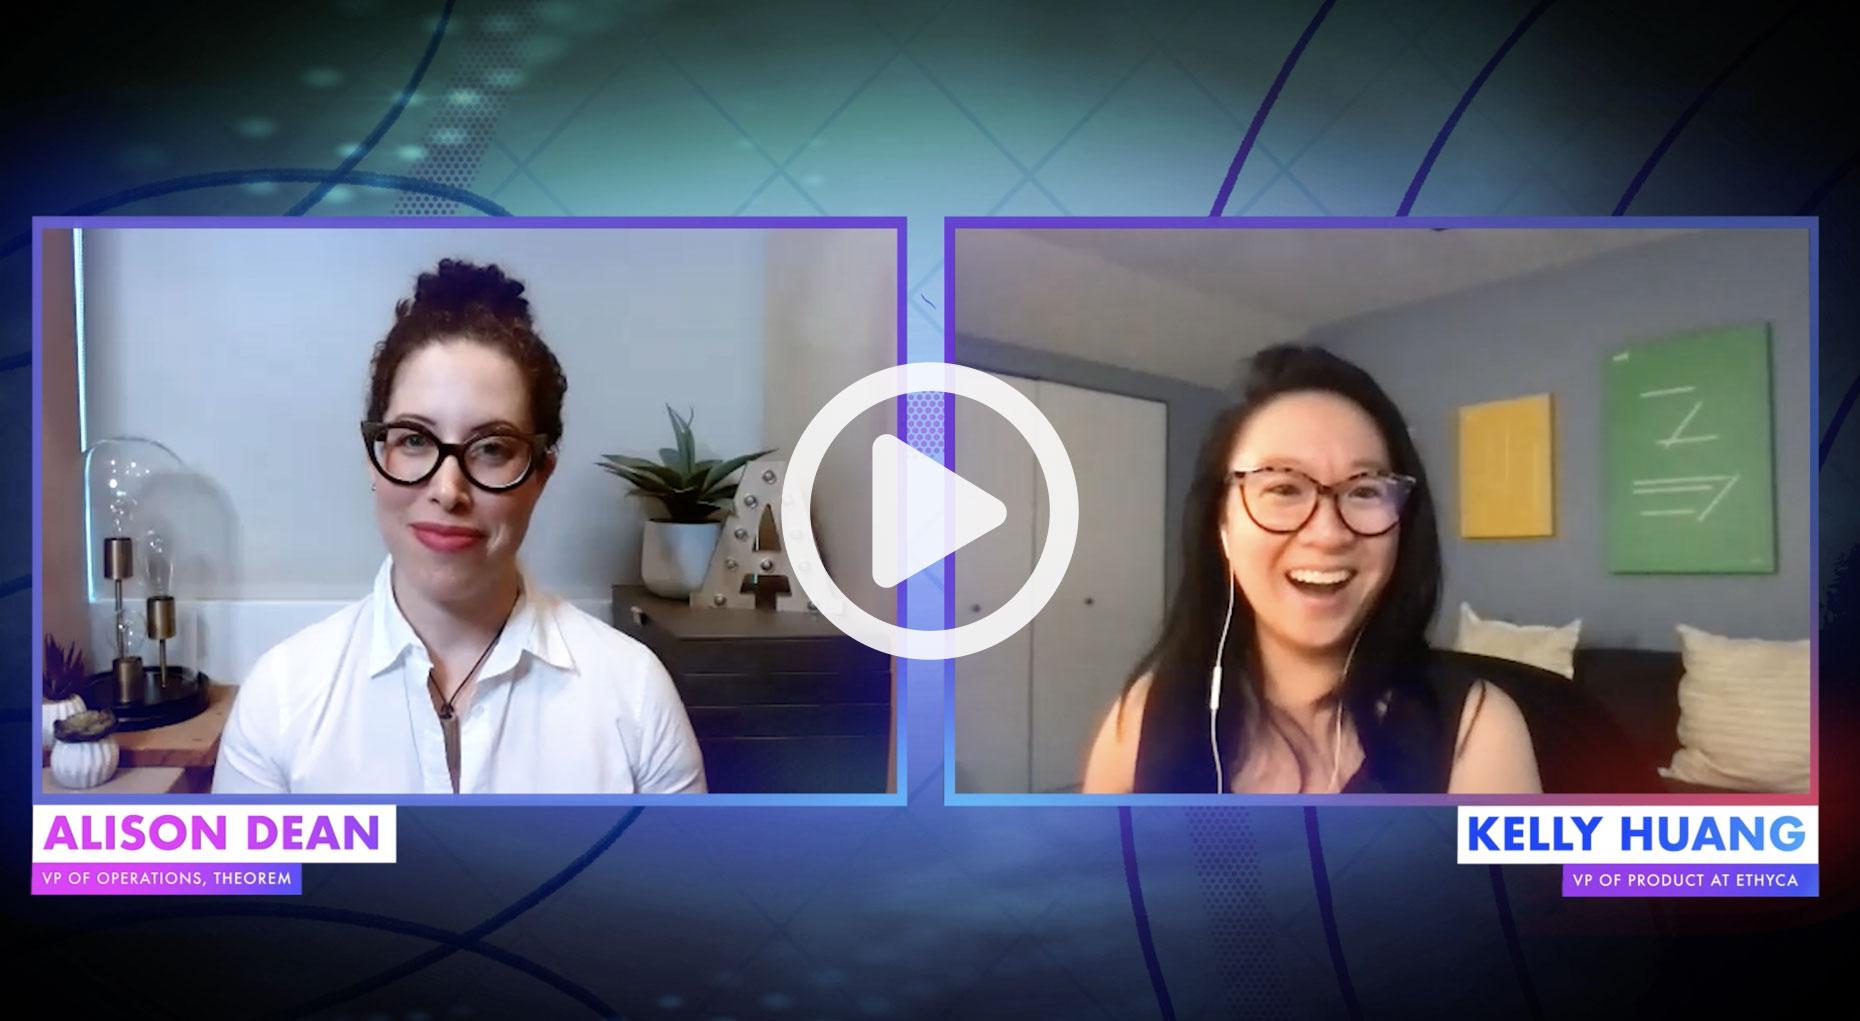 Kelly Huang Episode 7